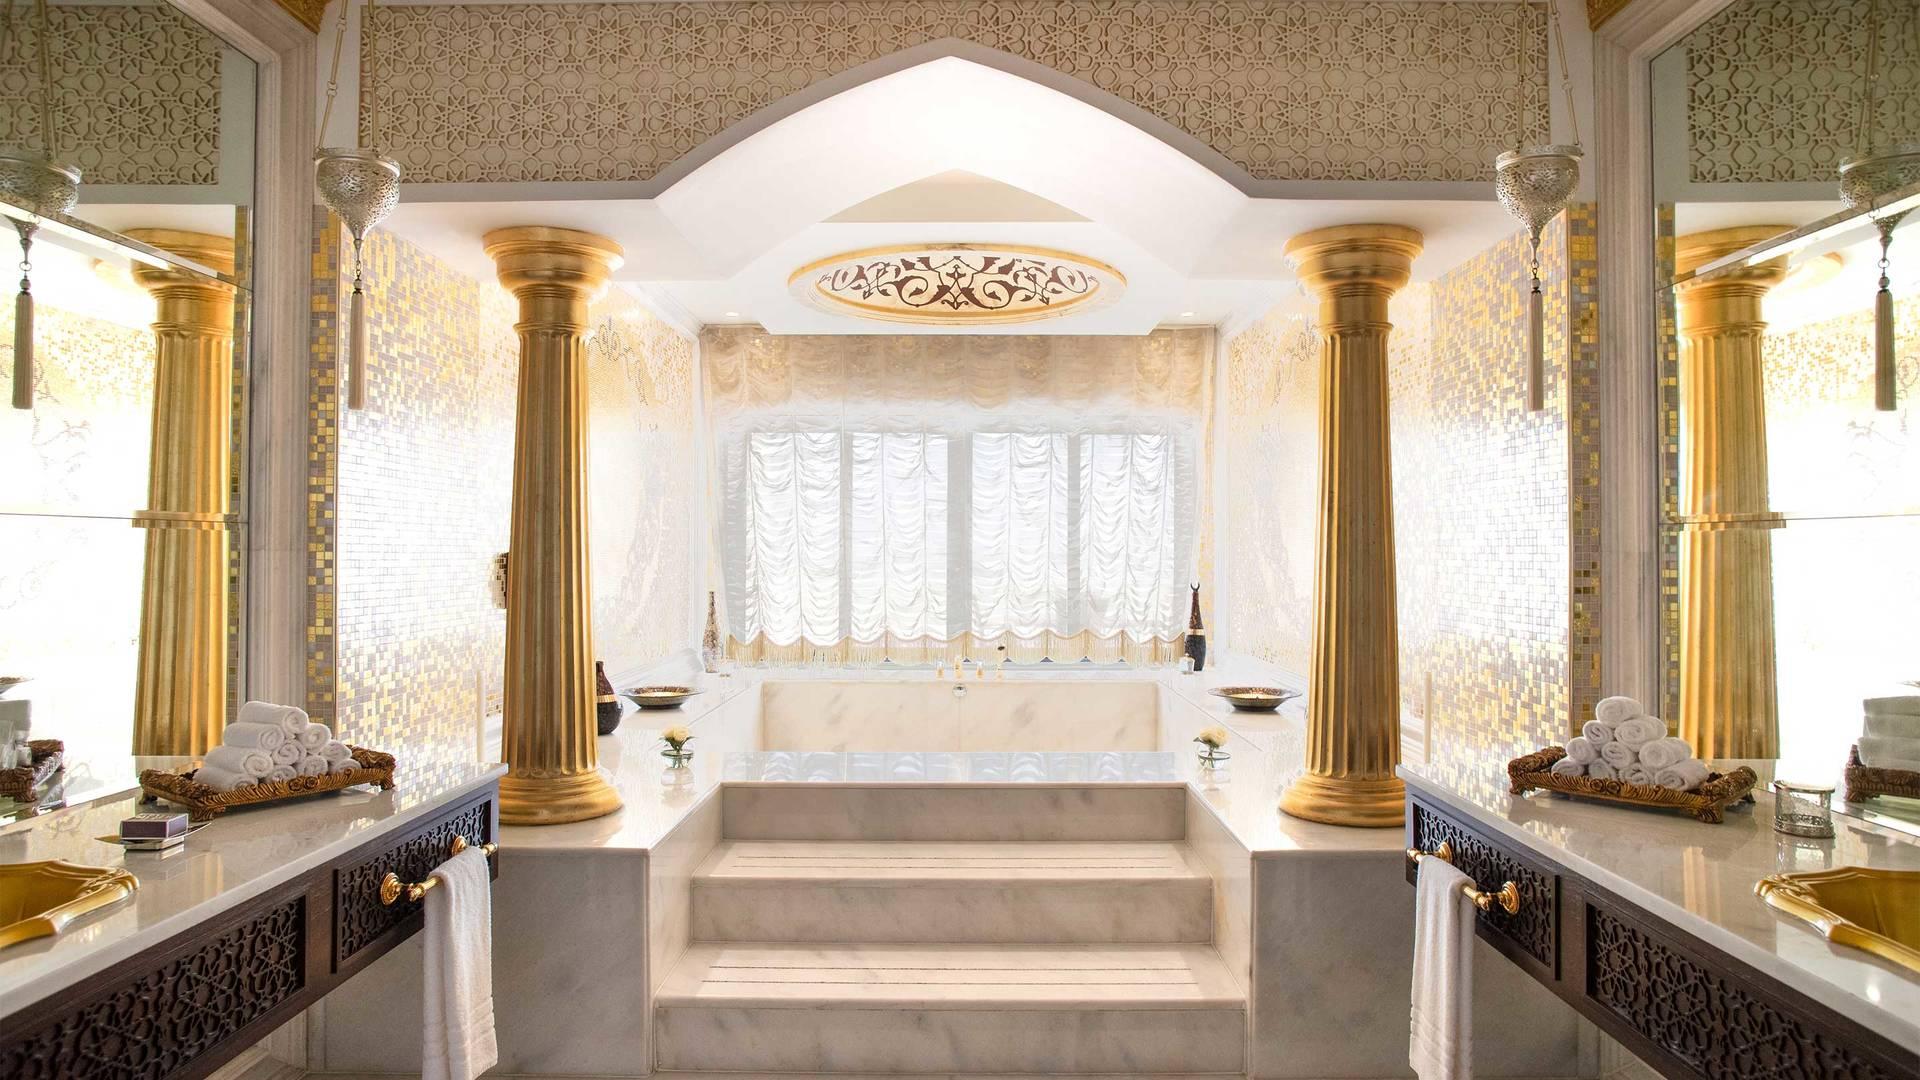 16-9 Room  Jumeirah Zabeel Saray Grand Imperial Suite Bathtub